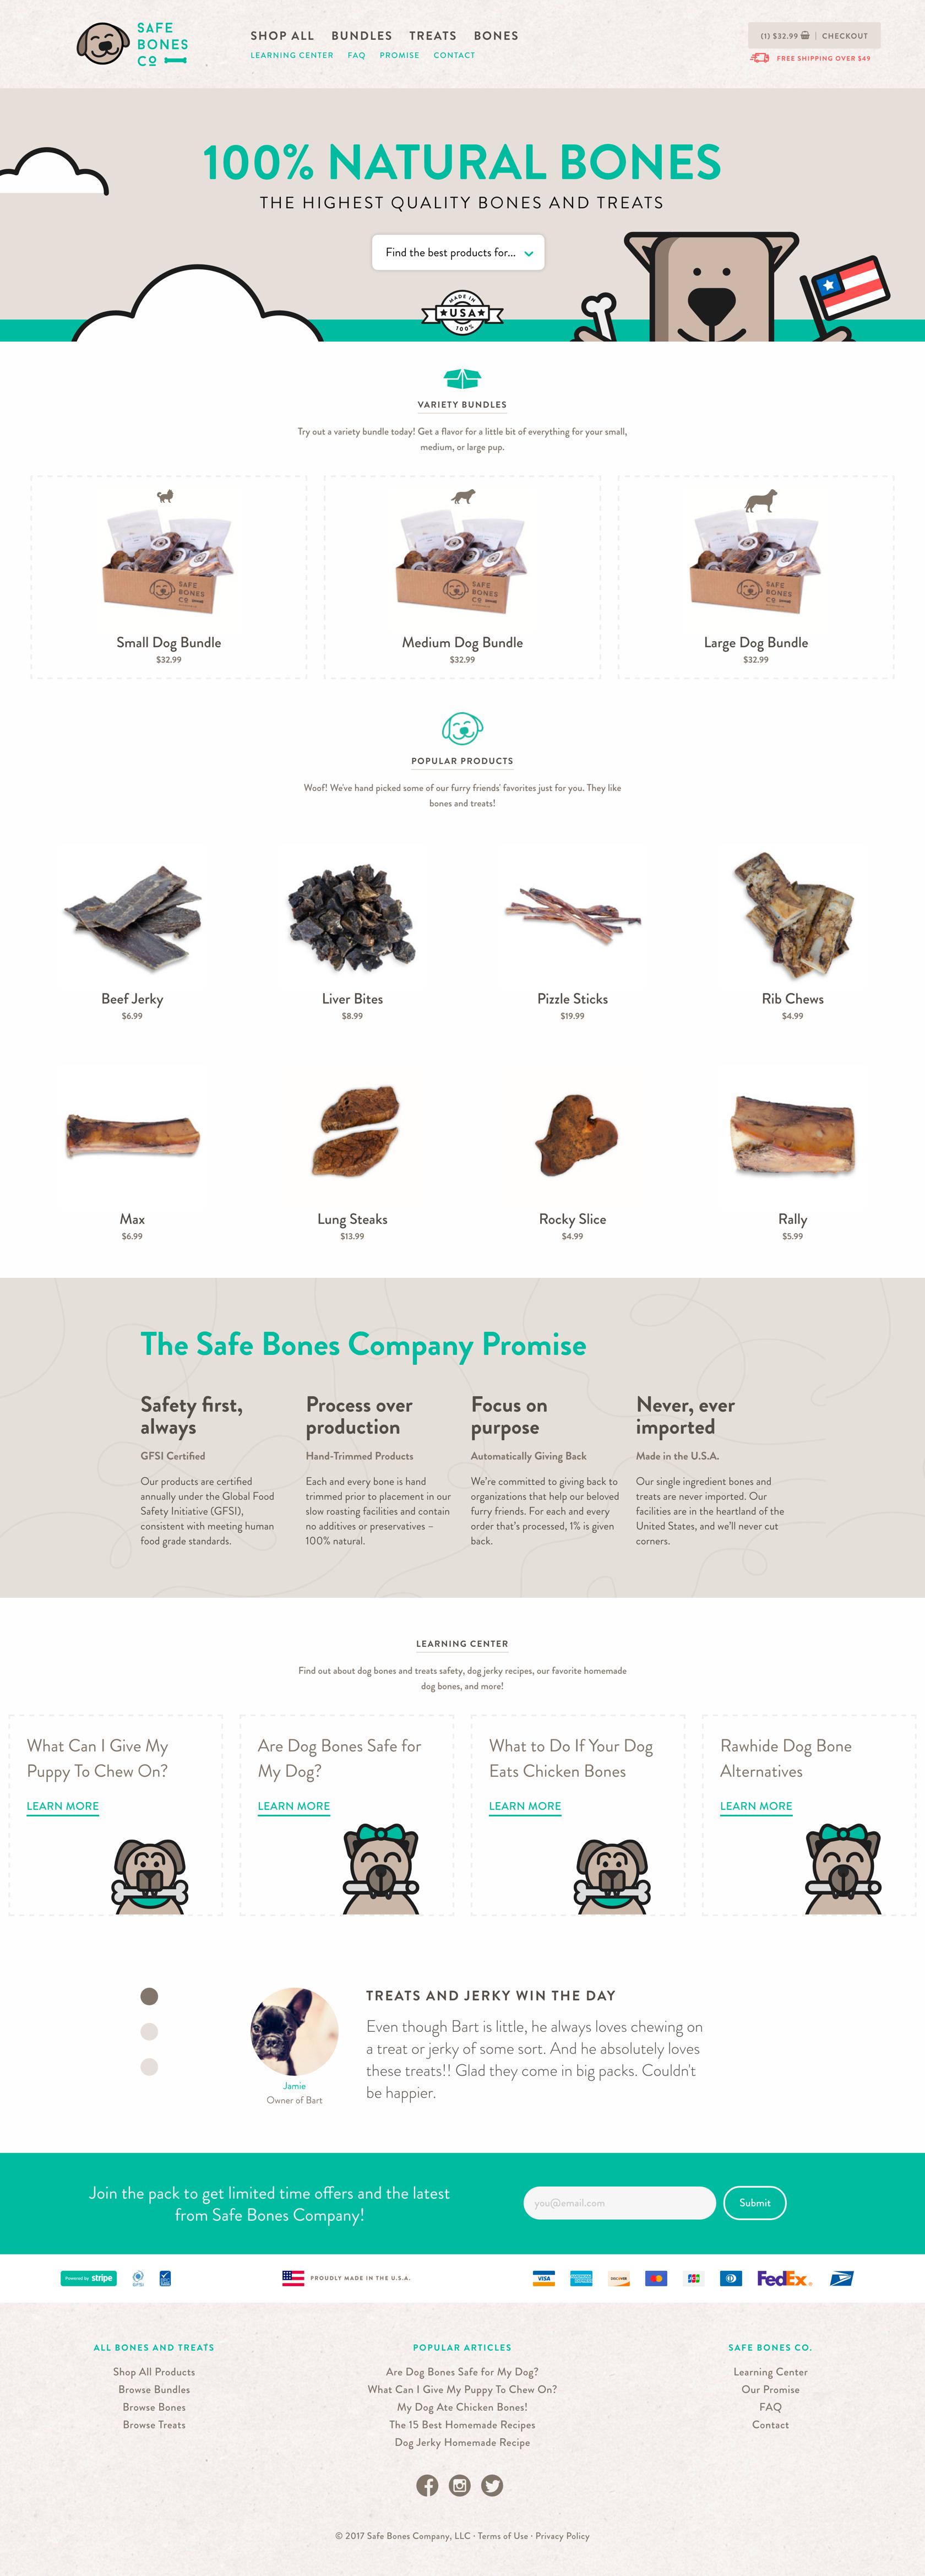 Safebones 01